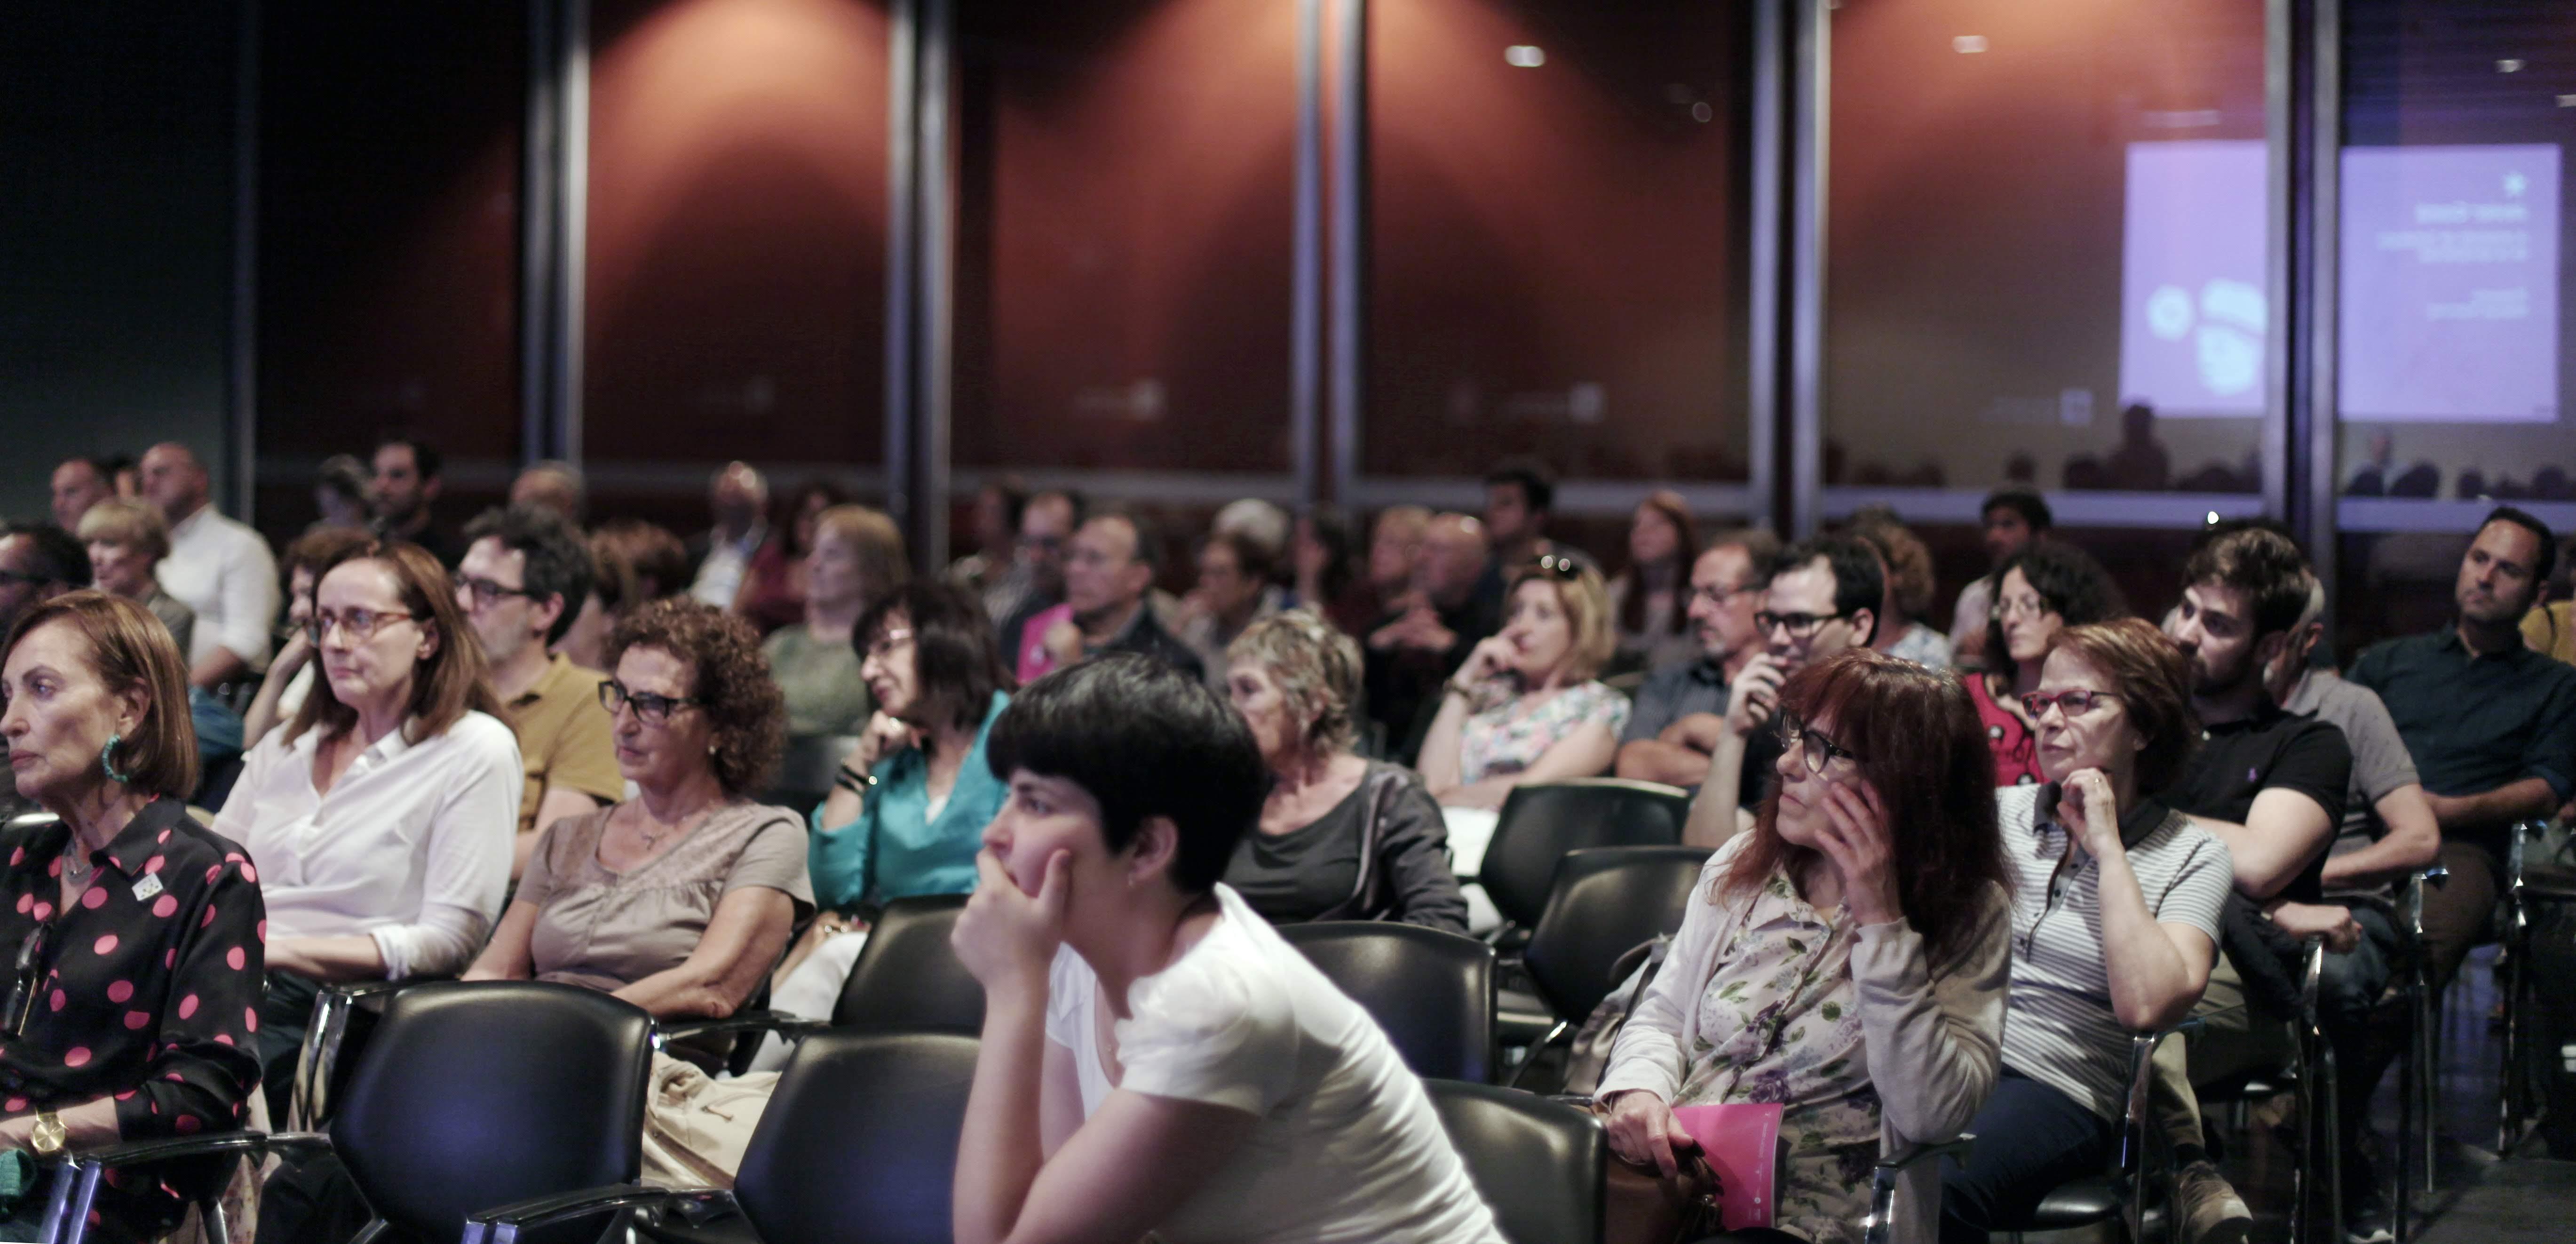 Asamblea anual de València Pensa: viernes 31 enero 2020